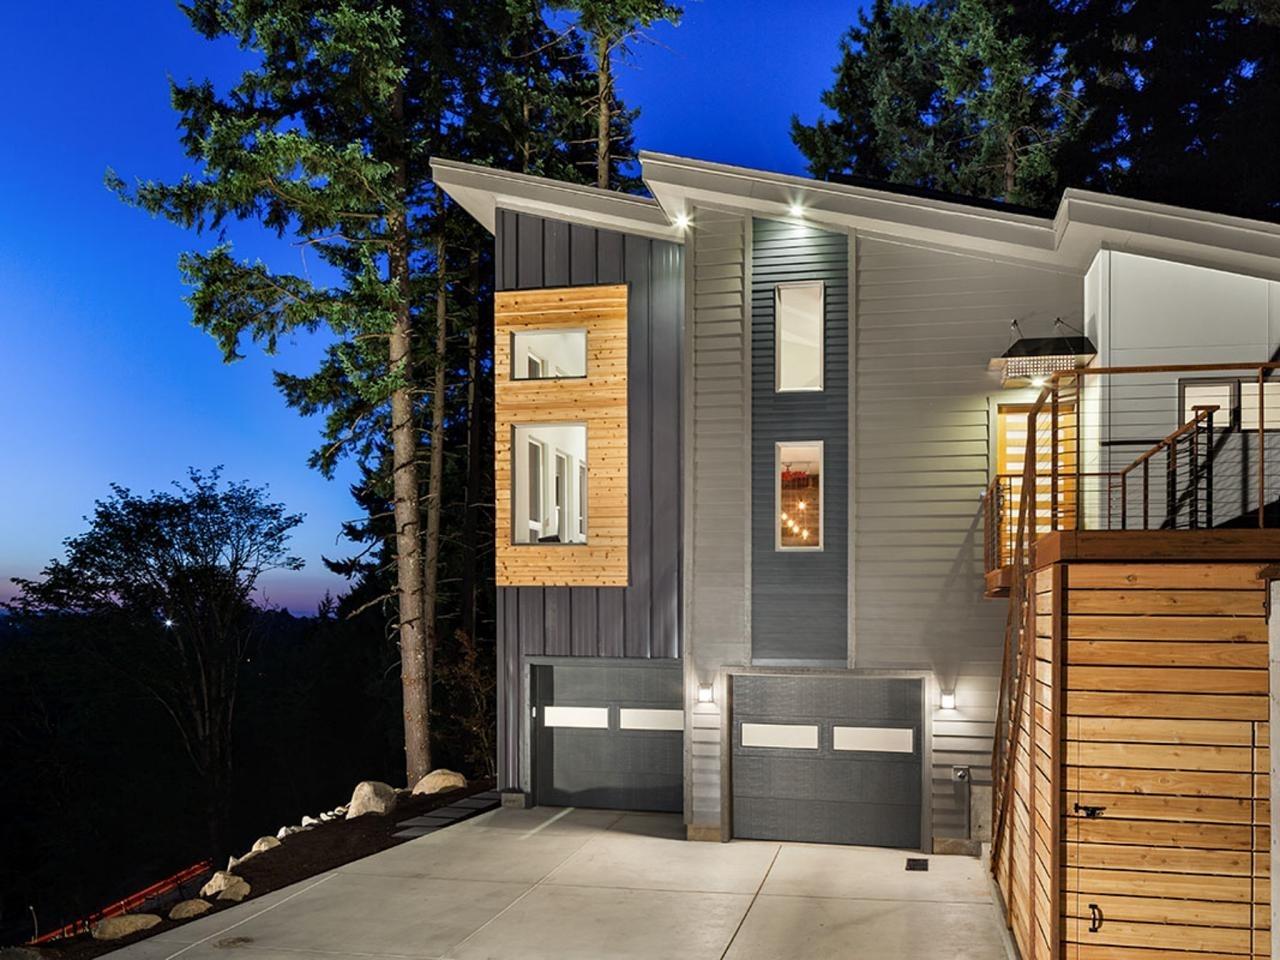 Split Level House Siding Ideas - Madison Art Center Design on Modern Siding Ideas  id=46507